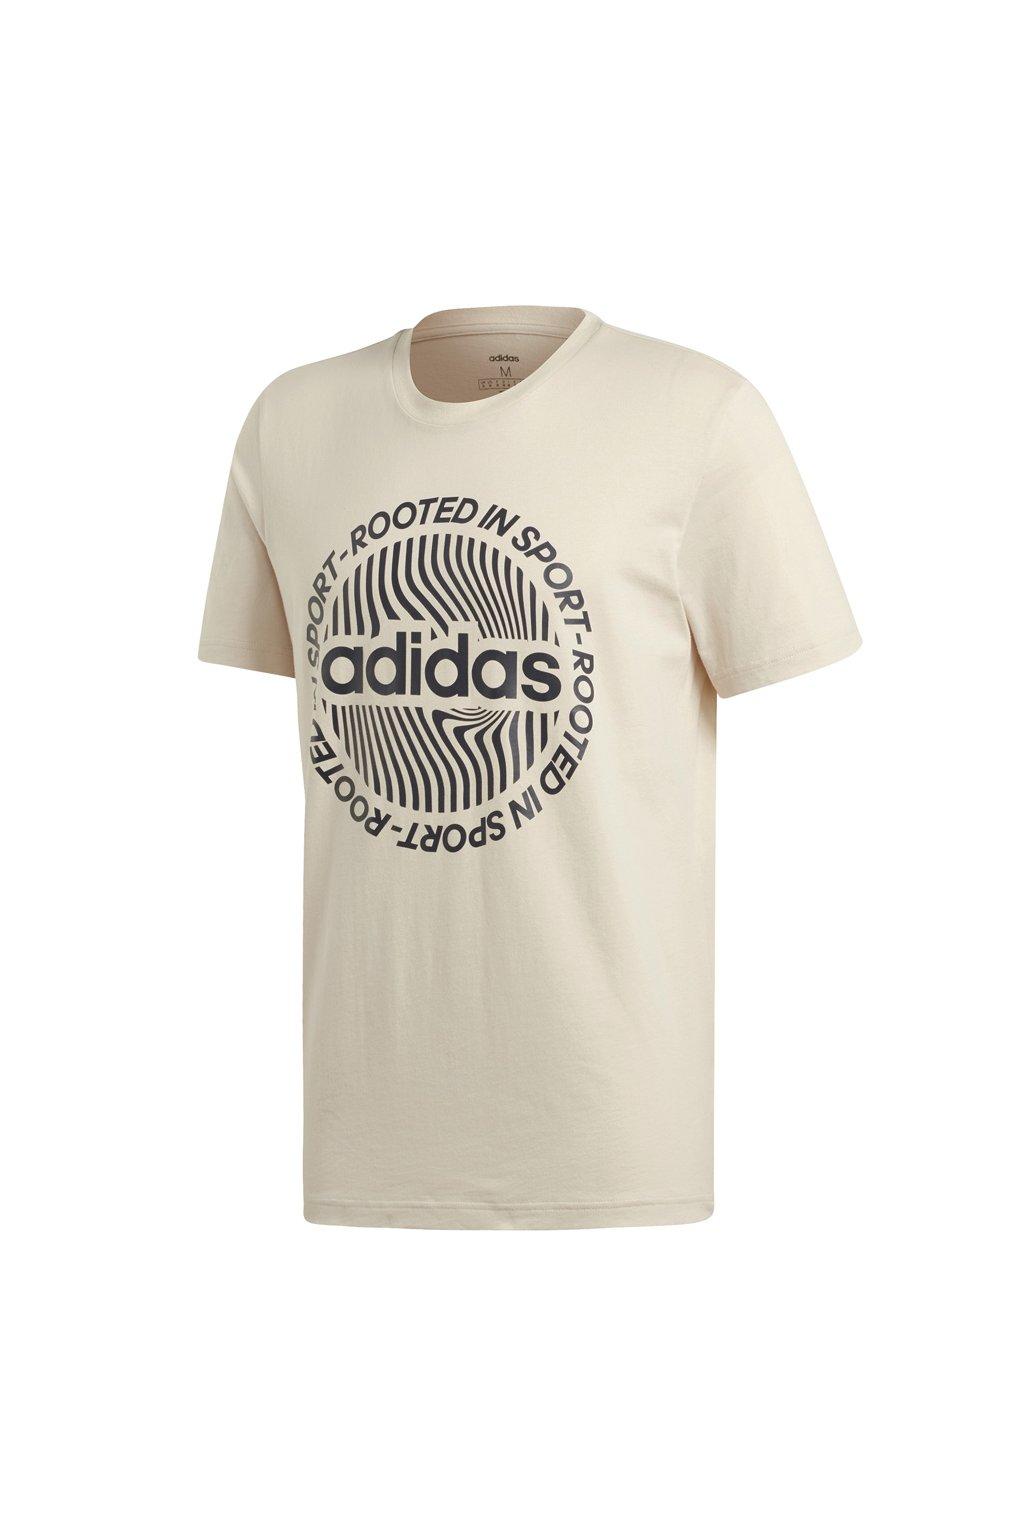 Pánske béžové tričko Adidas M CRCLD GRFX T EI4611